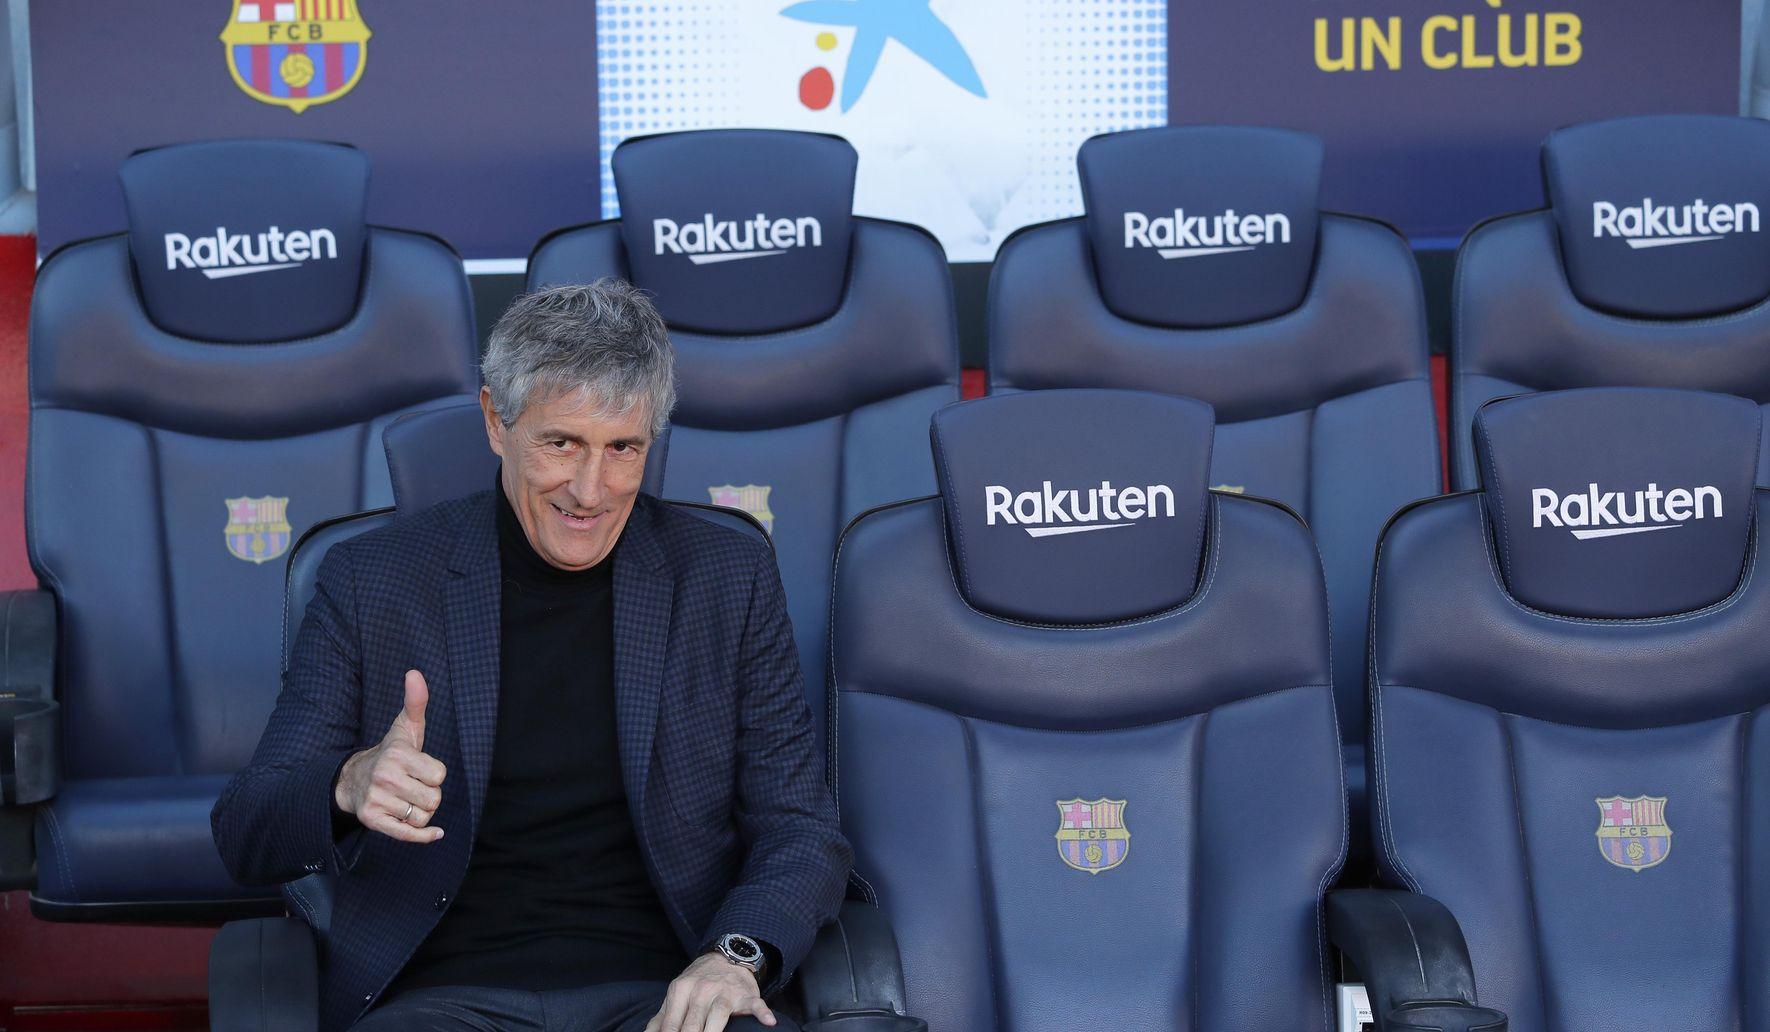 Spain_soccer_barcelona_setien_15256_c0-217-5181-3237_s1770x1032